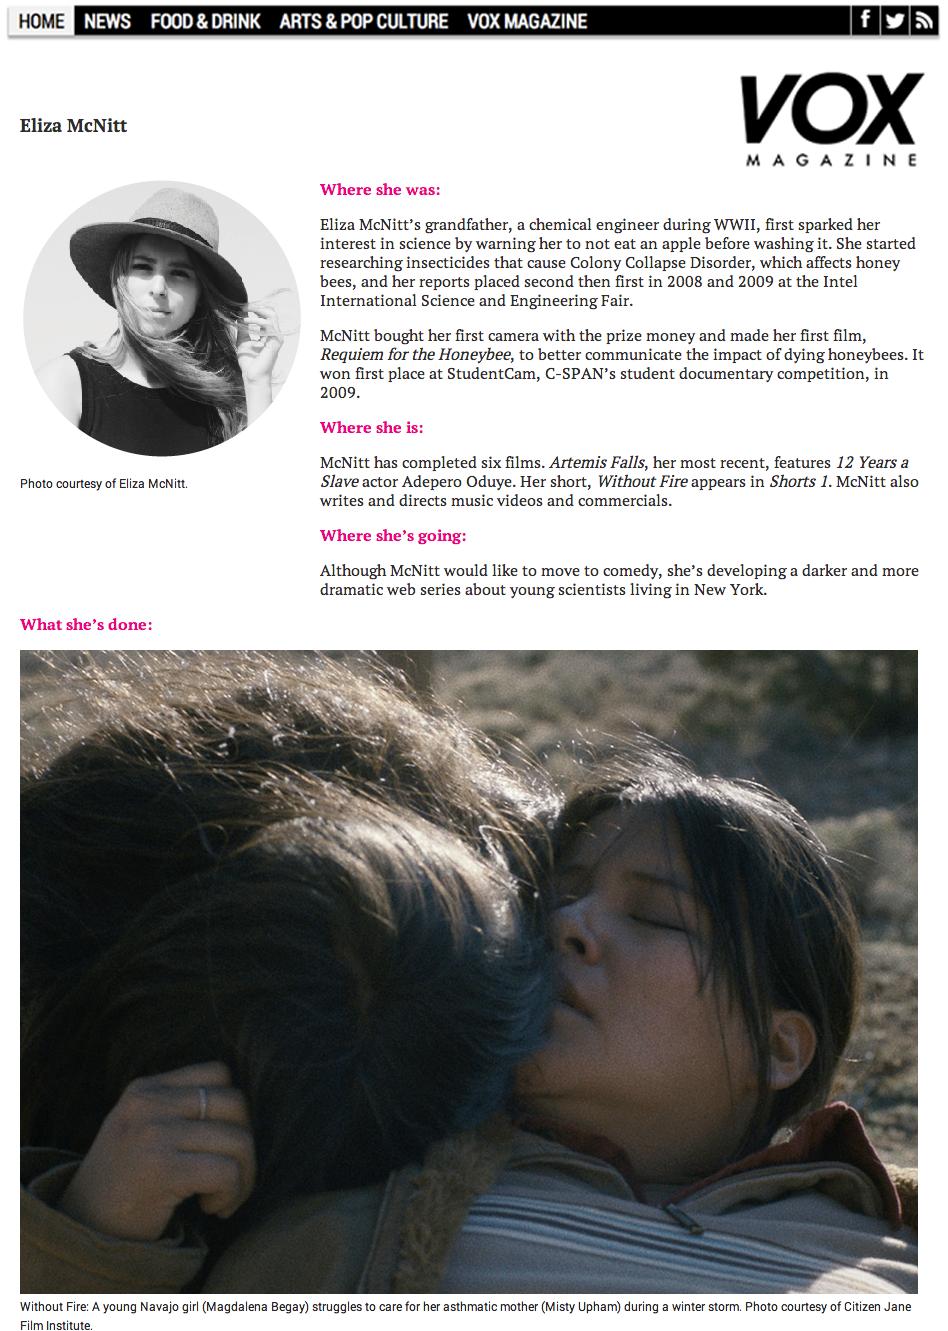 VOX Magazine Artist Profile